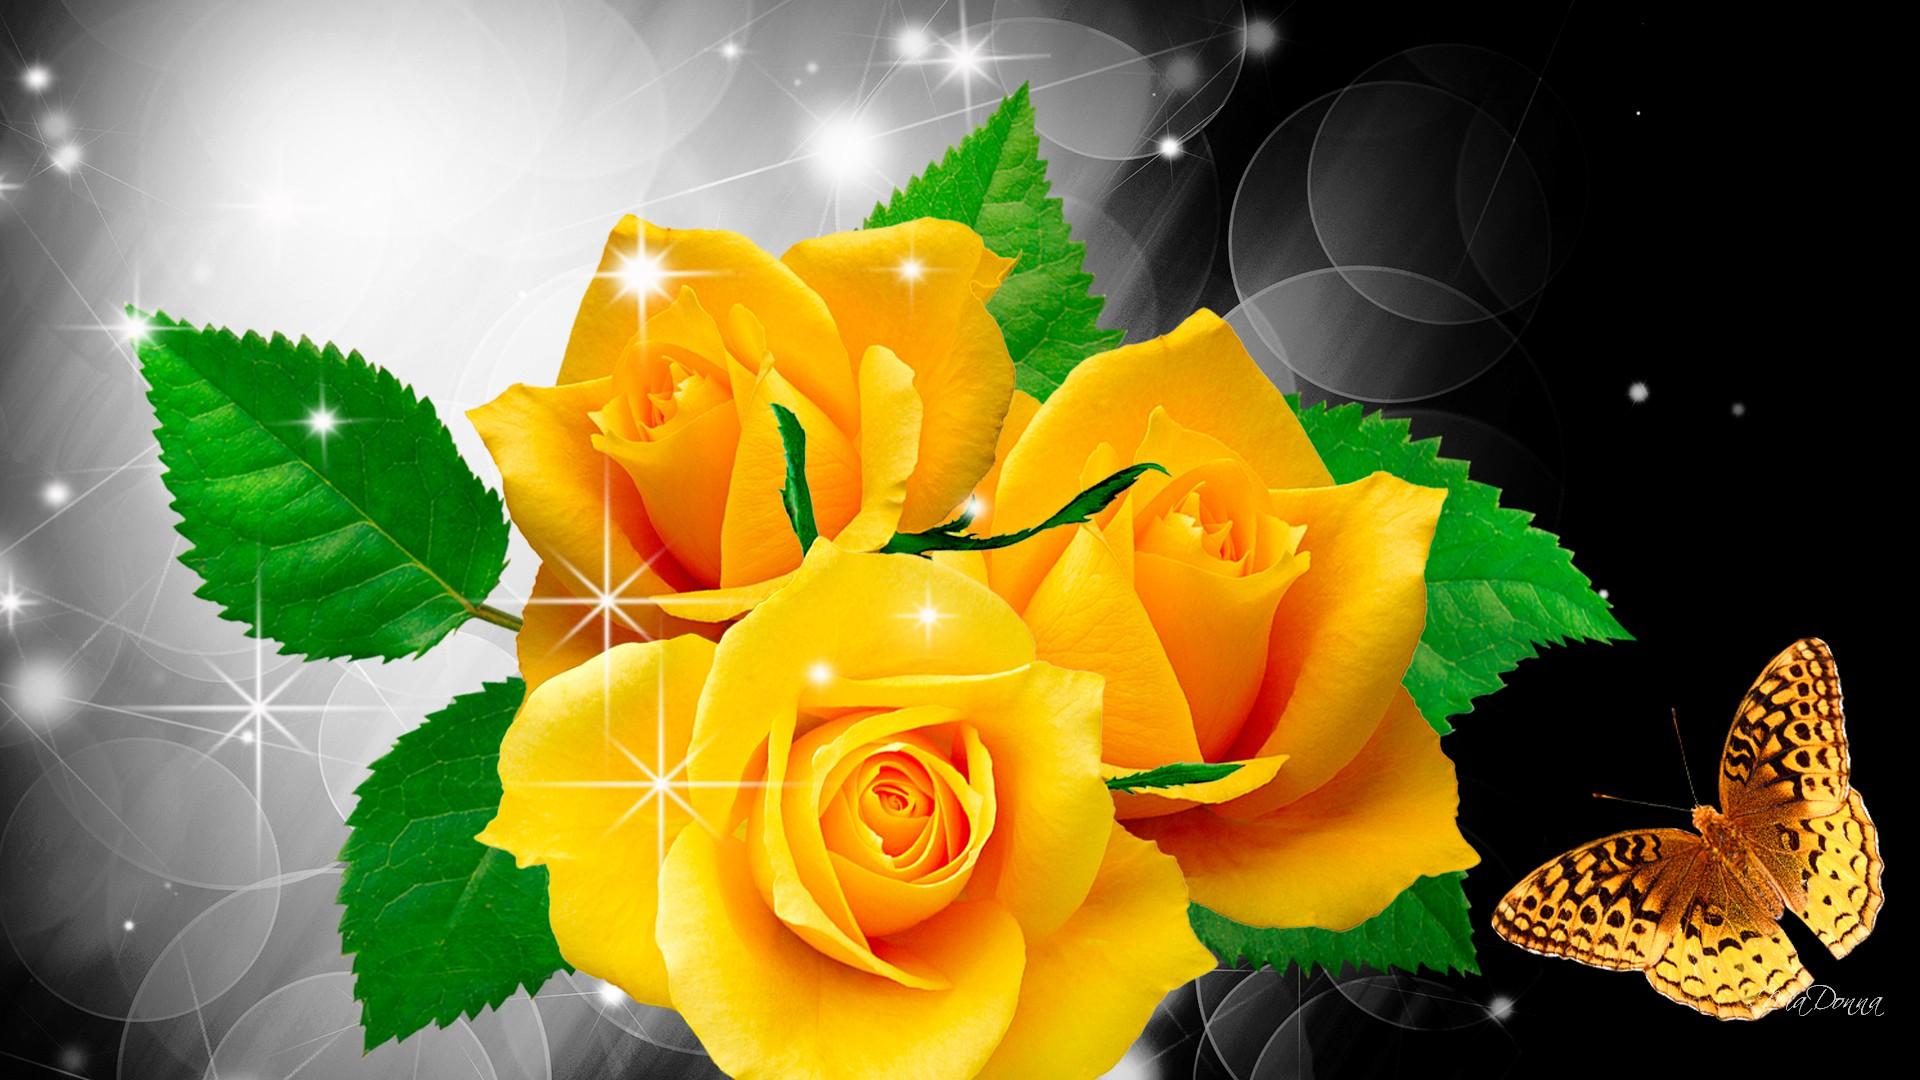 Hd wallpaper yellow rose - Hd Wallpaper Yellow Rose Yellow Rose Wallpapers High Quality Free